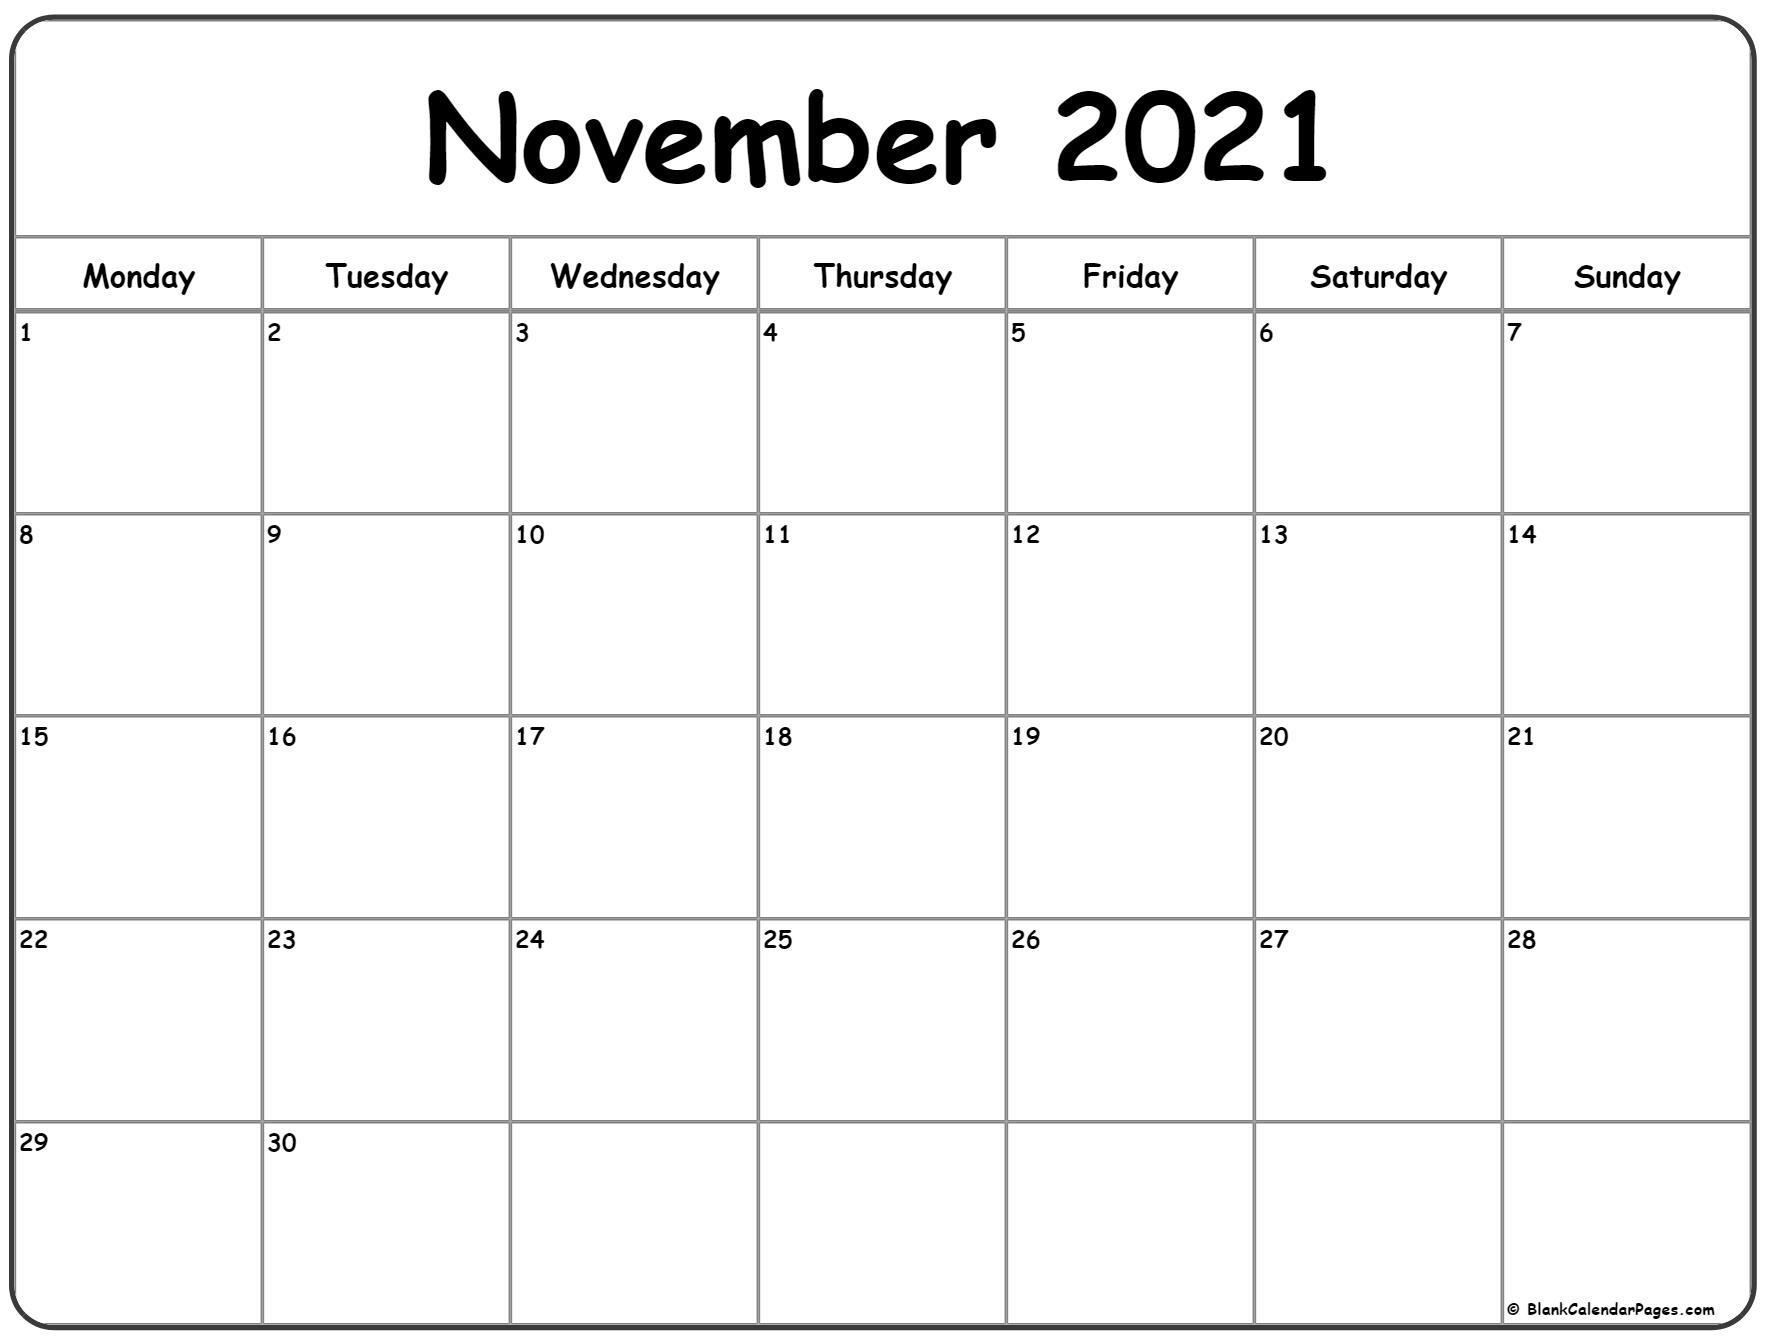 Collect November Calandars 2021